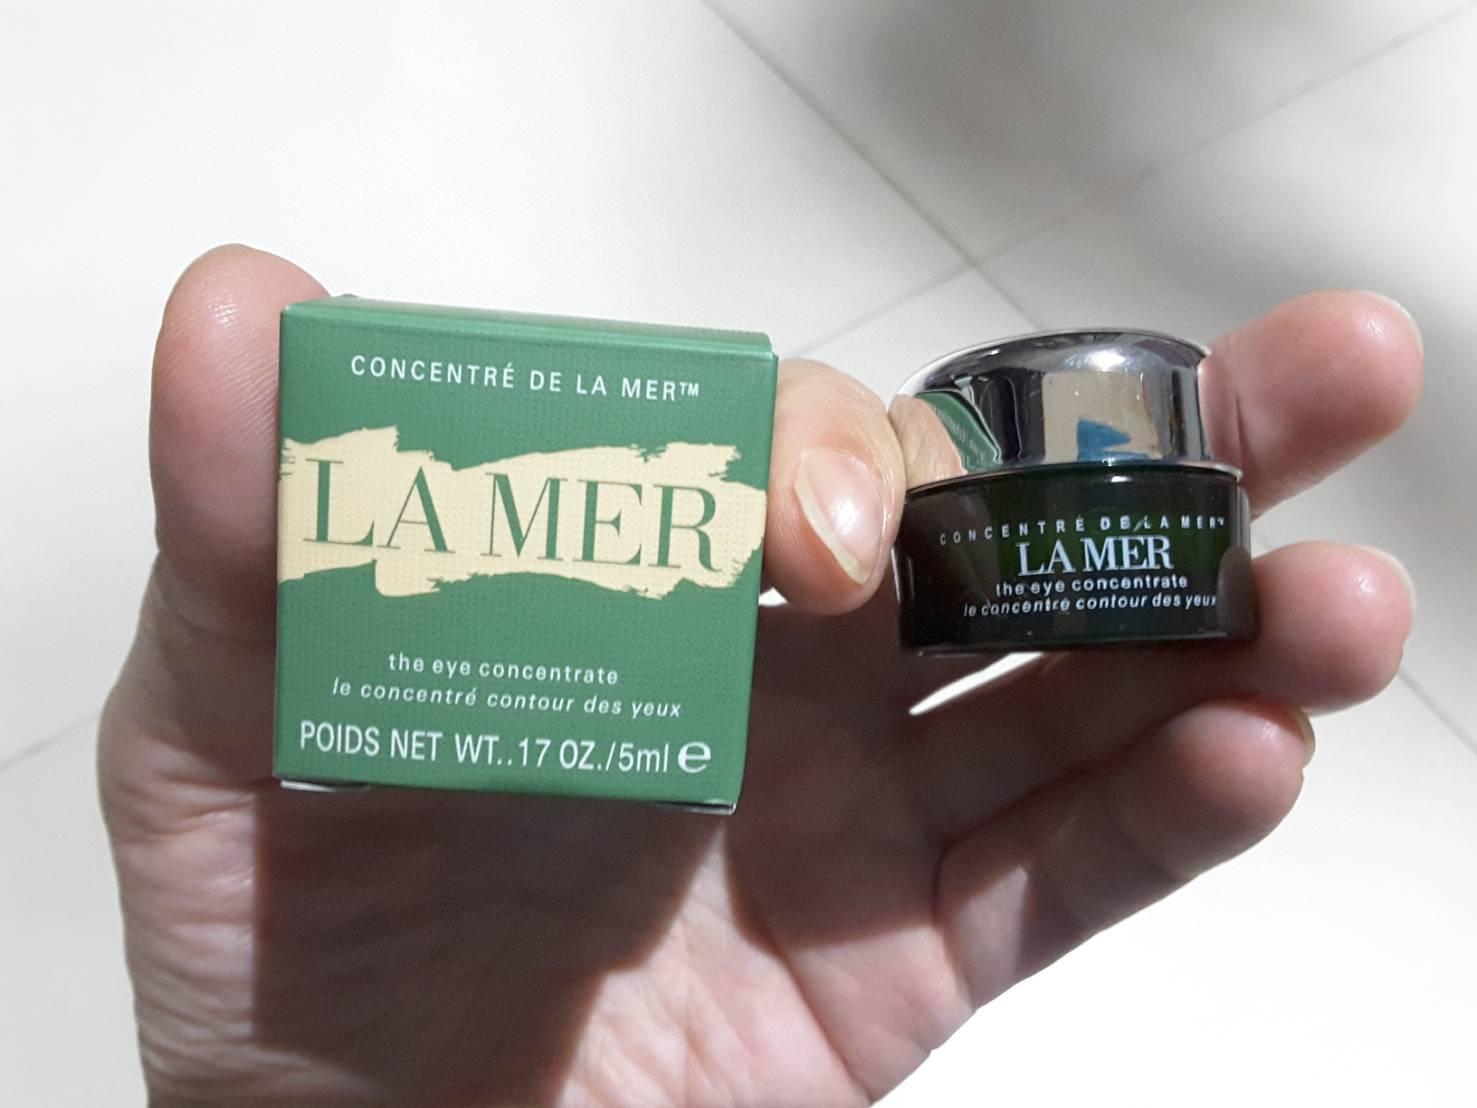 Lamer The Eye Concentrate ขนาดทดลอง 5 ml. แบบกระปุก (รุ่นกล่องซับด้านใน)